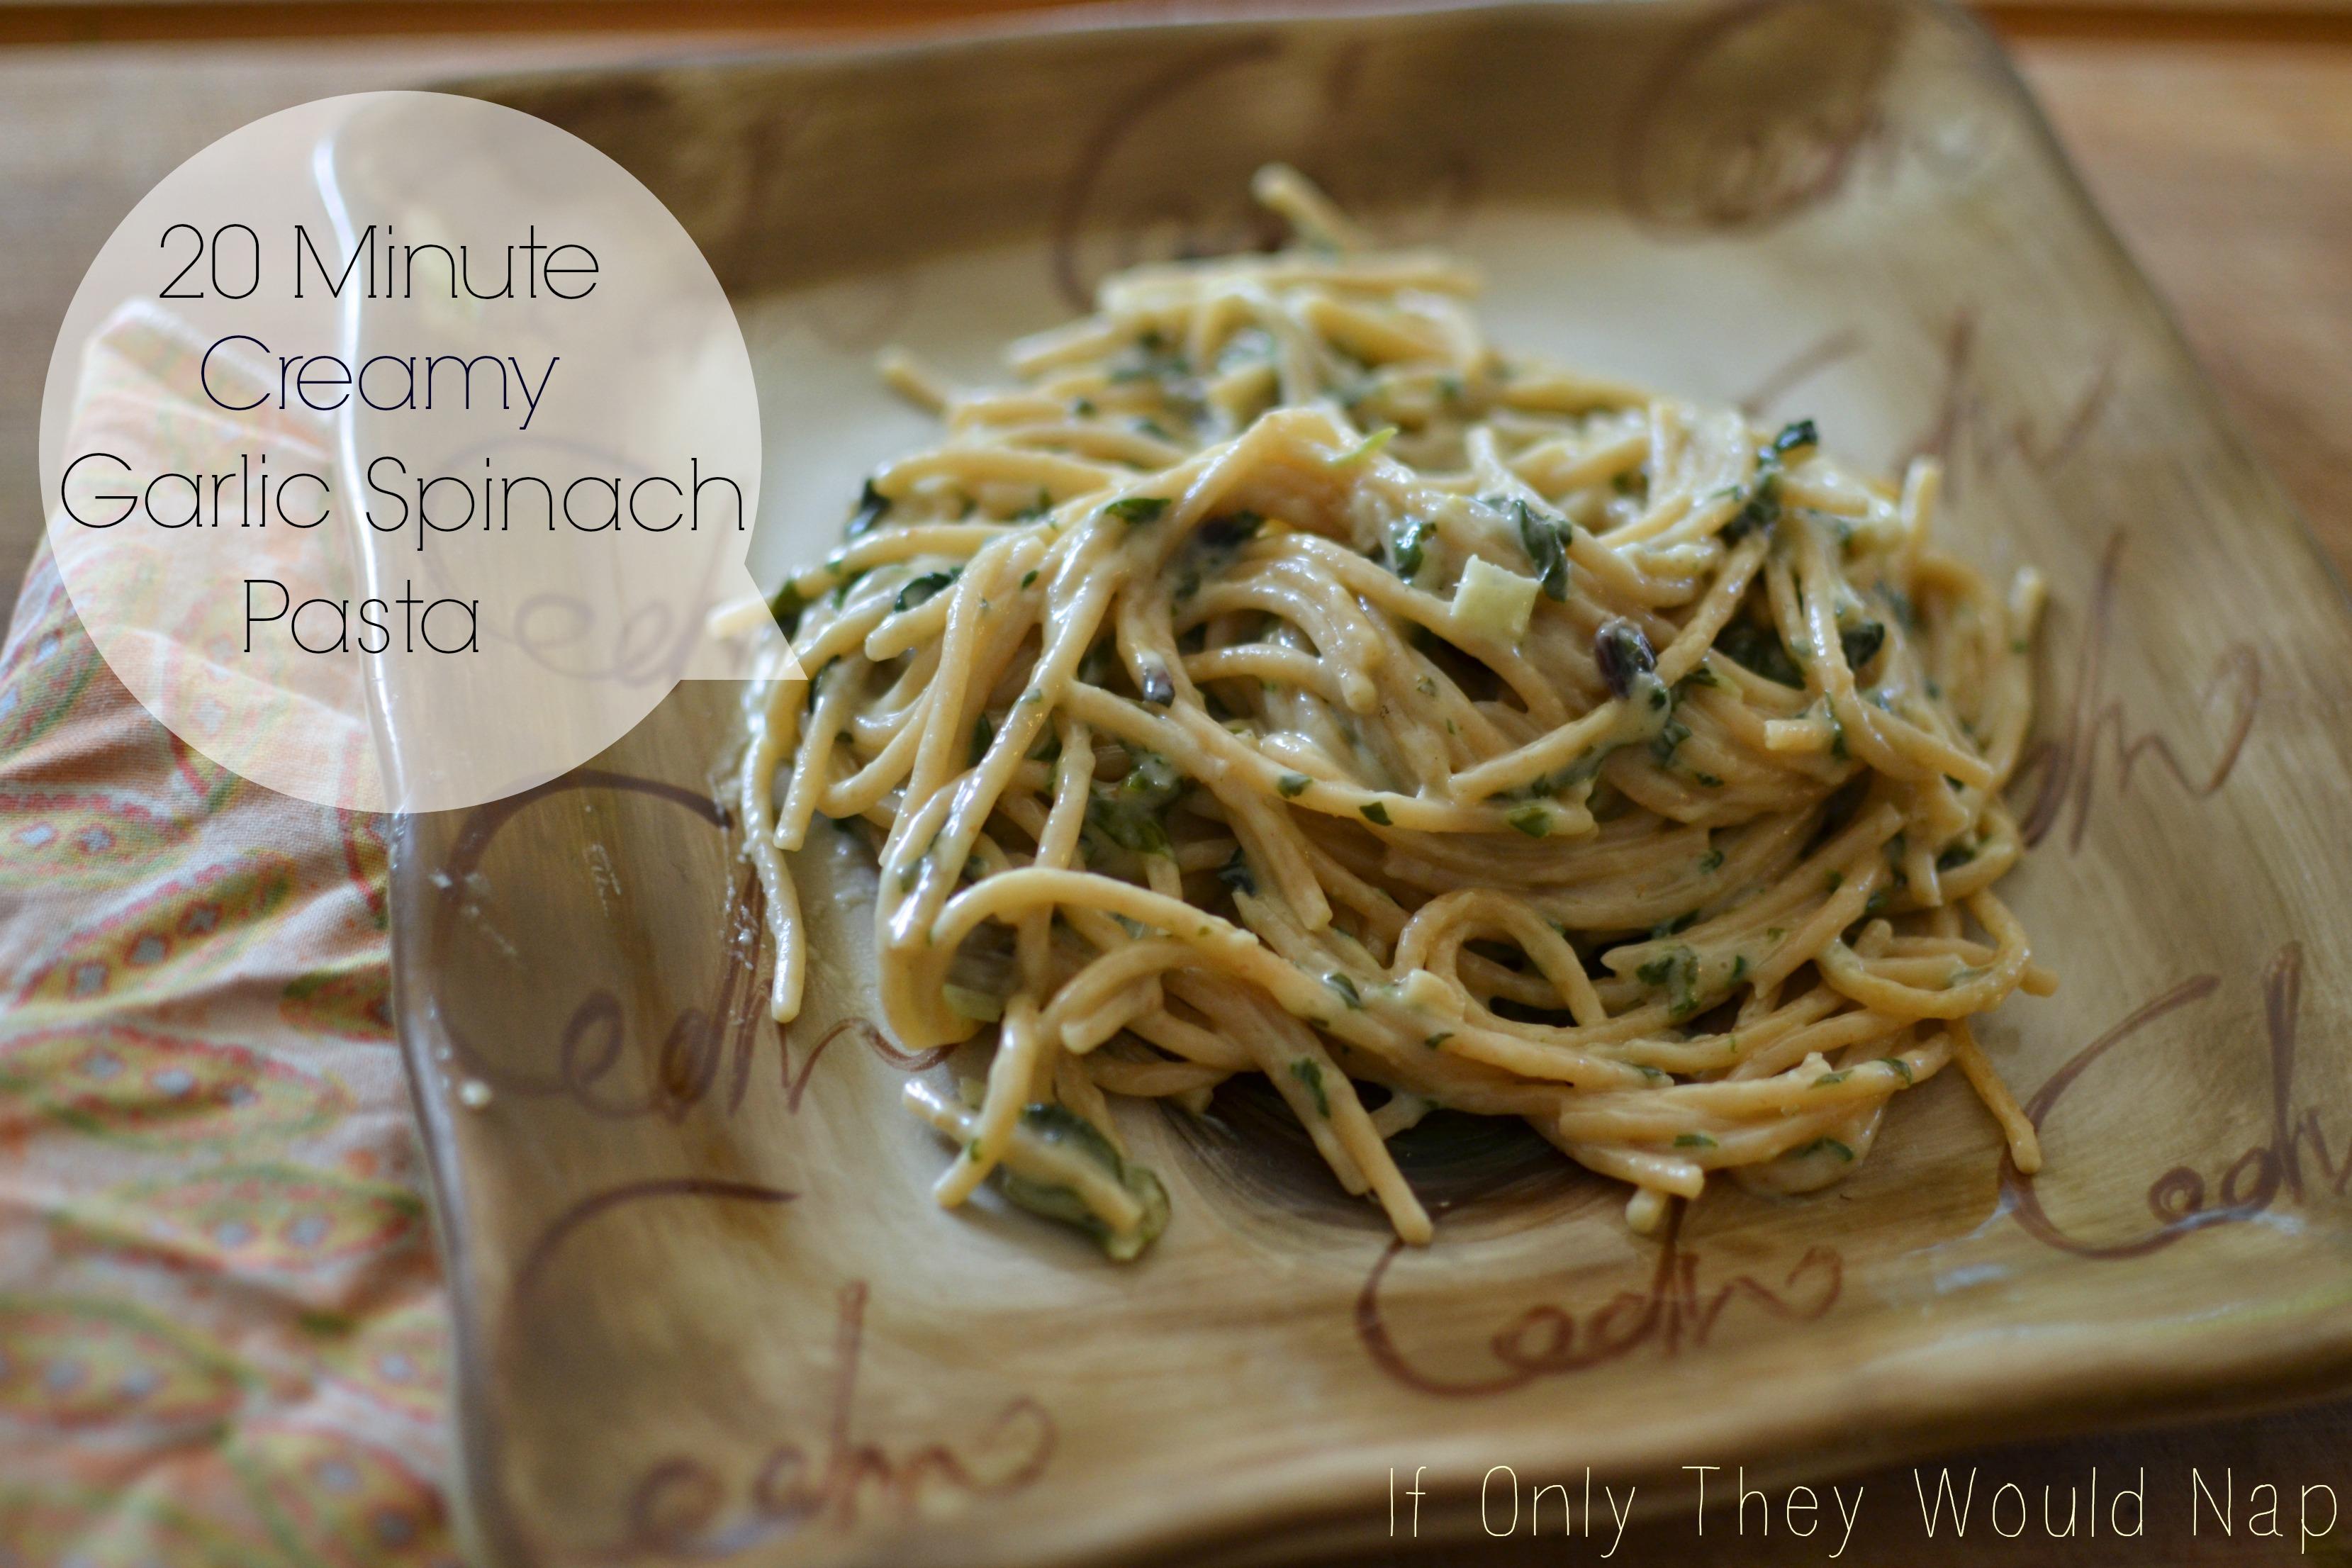 20 Minute Creamy Garlic Spinach Pasta